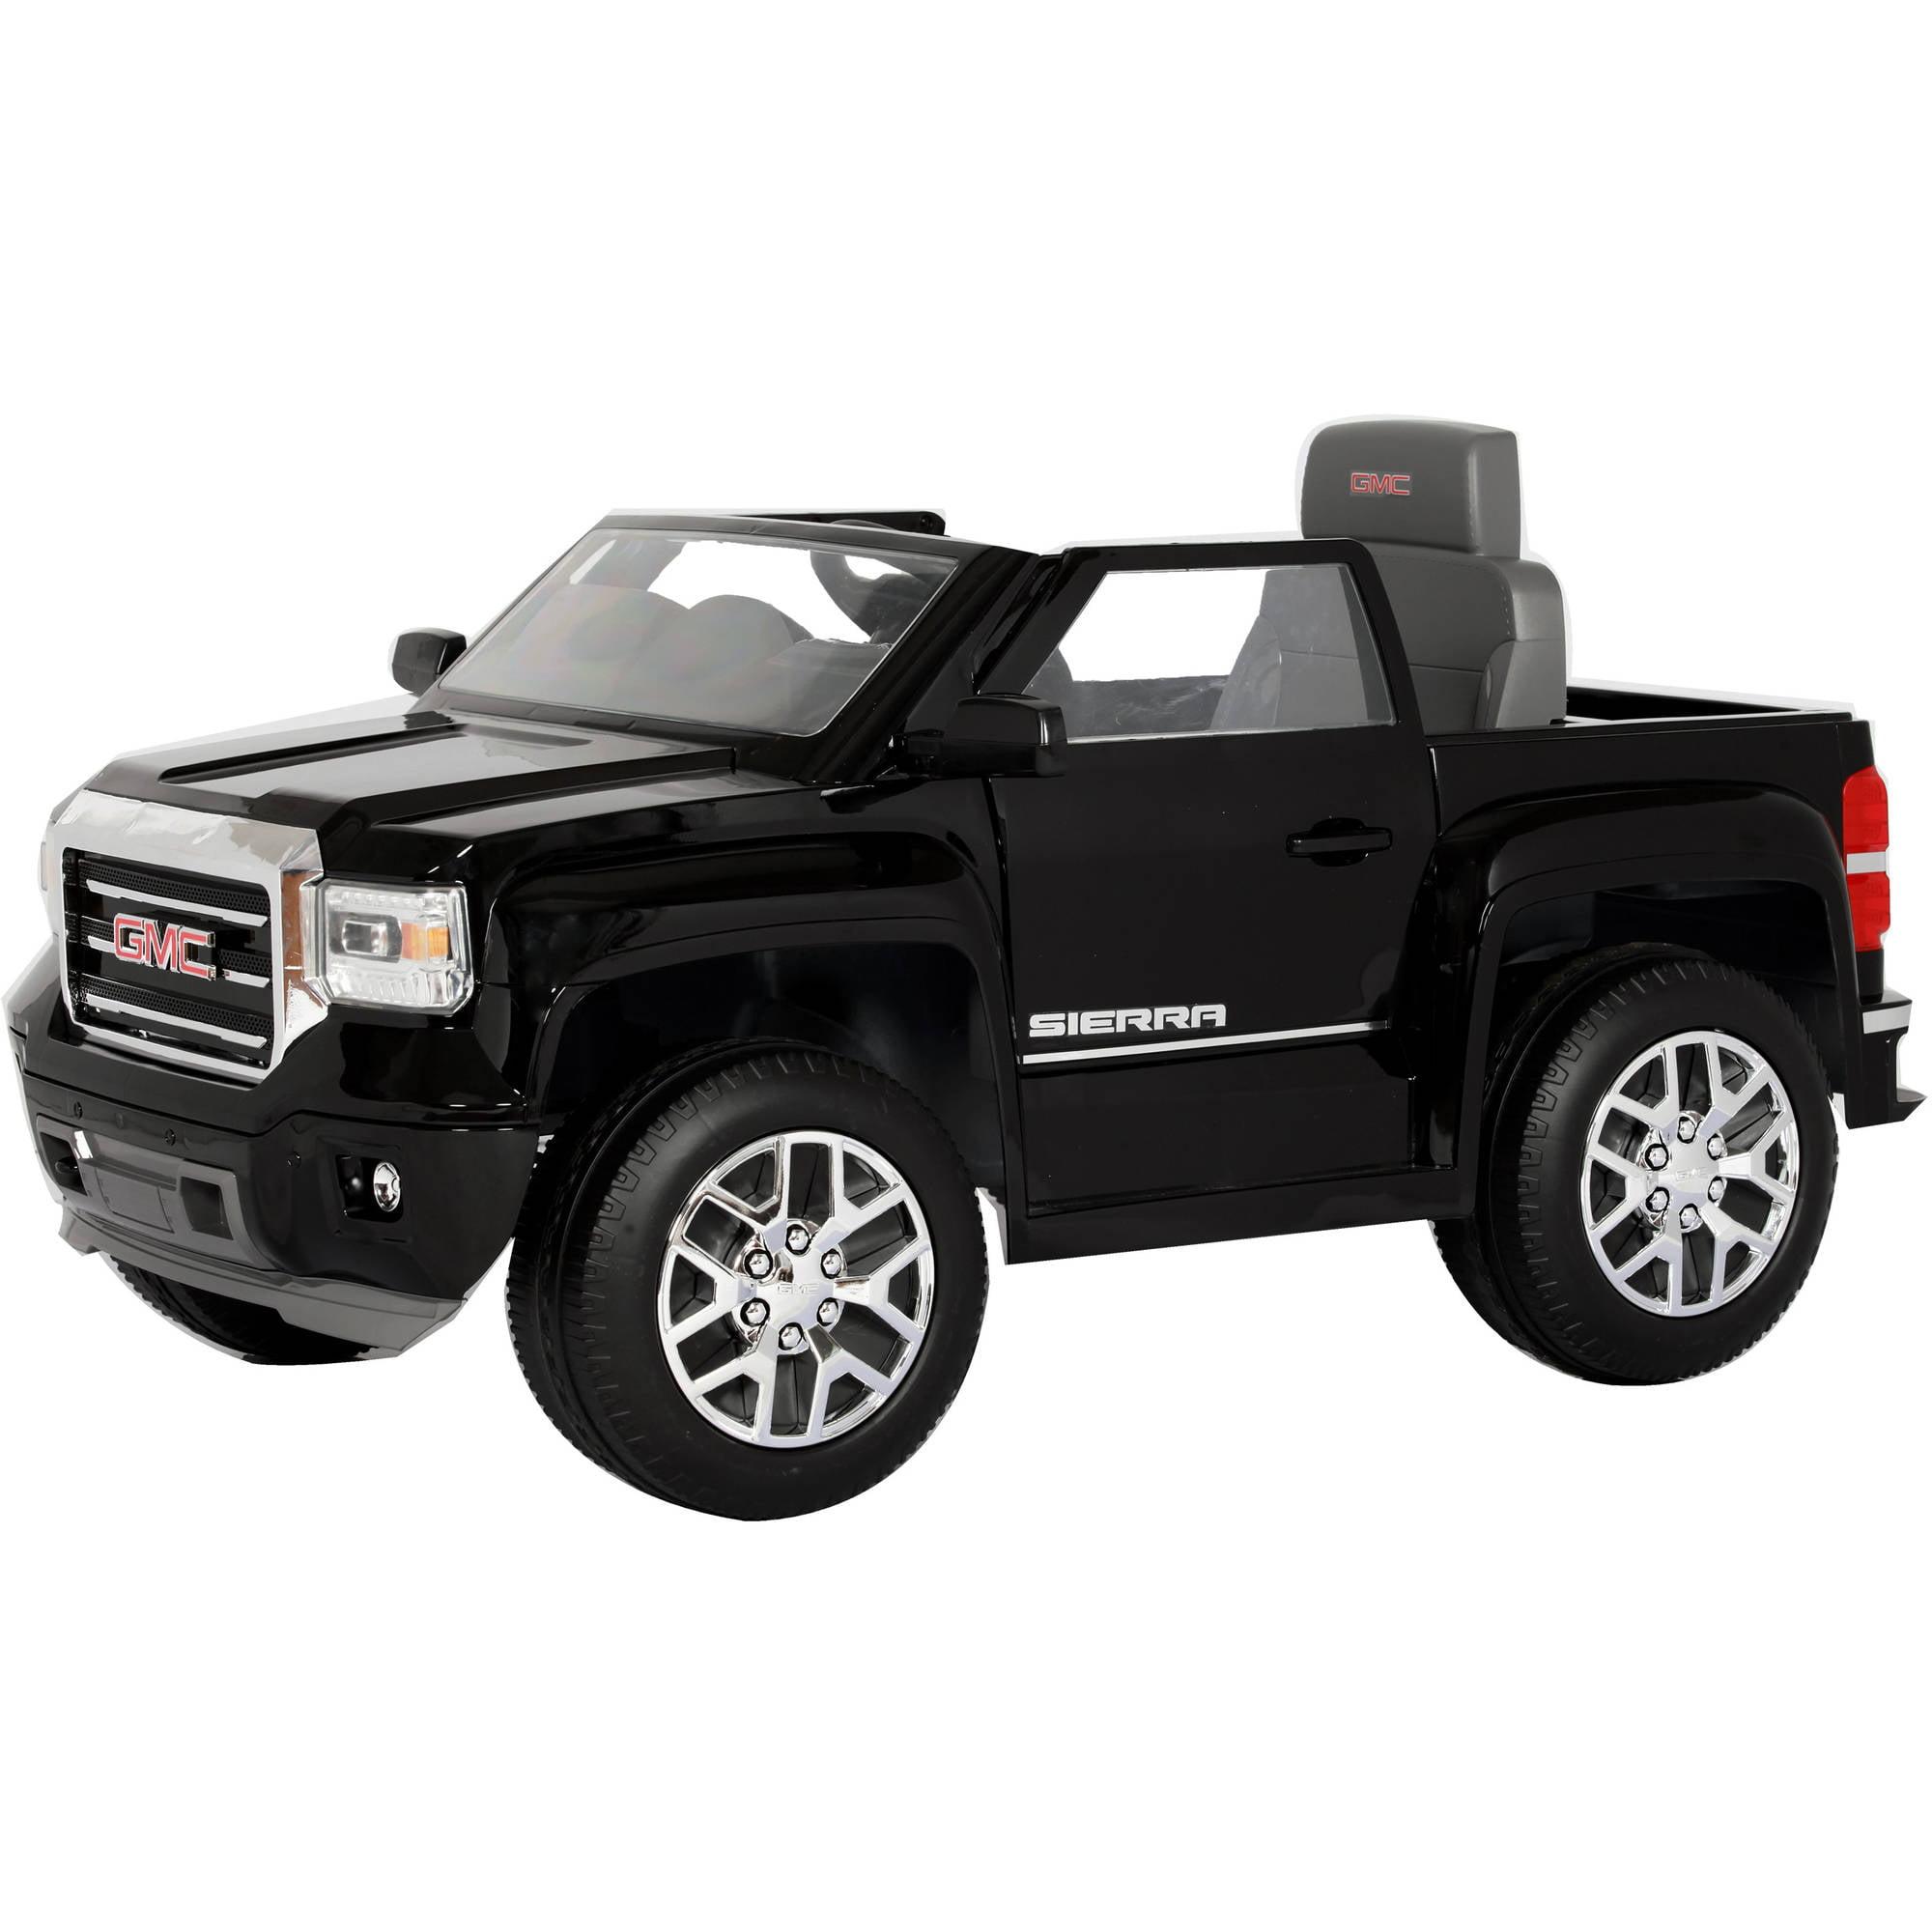 sierra z calland accessories gmc grid truck dysania